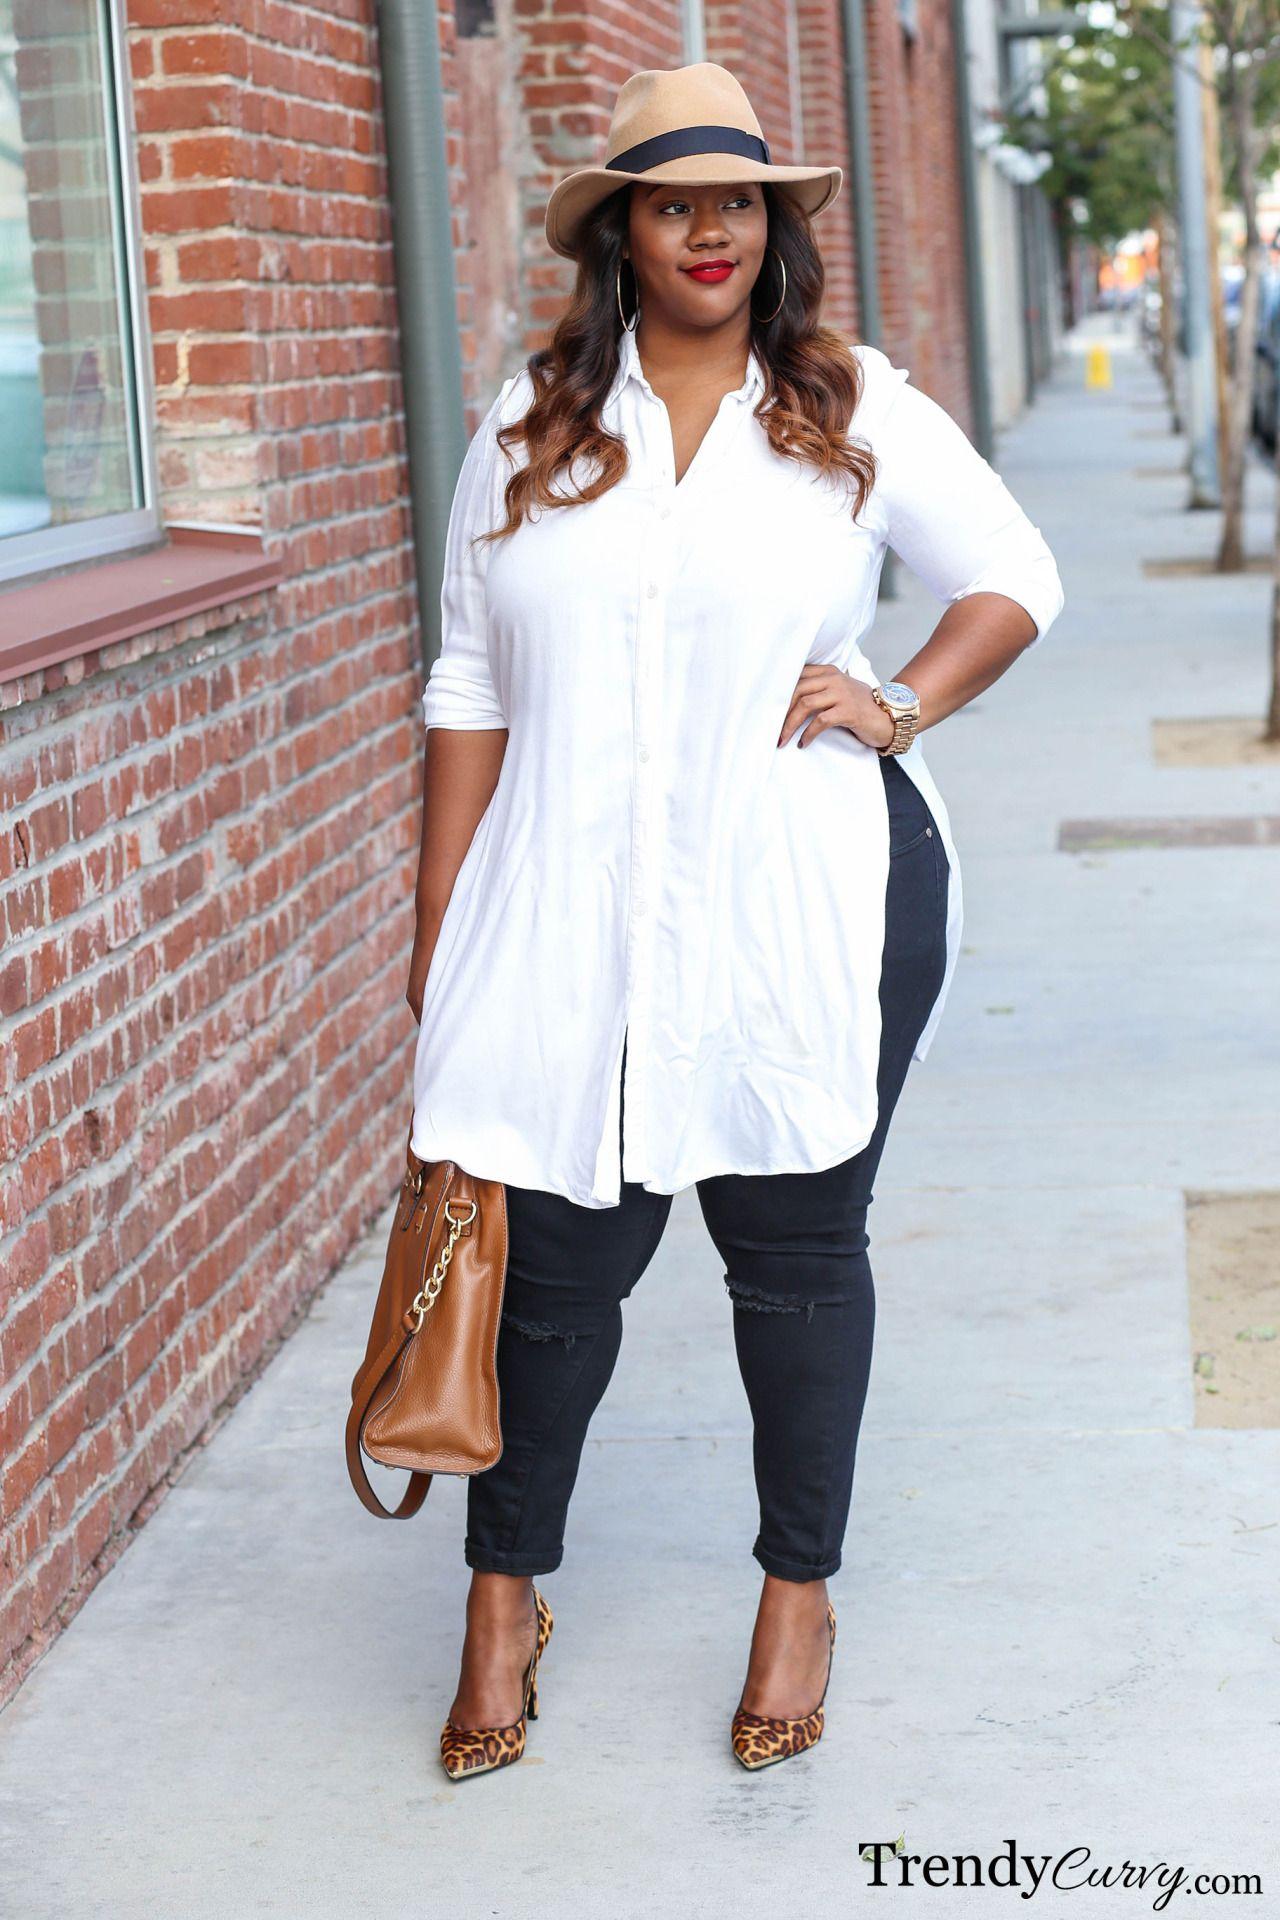 Trendy Fashion Blog: Plus Size Fashion & Style Blog